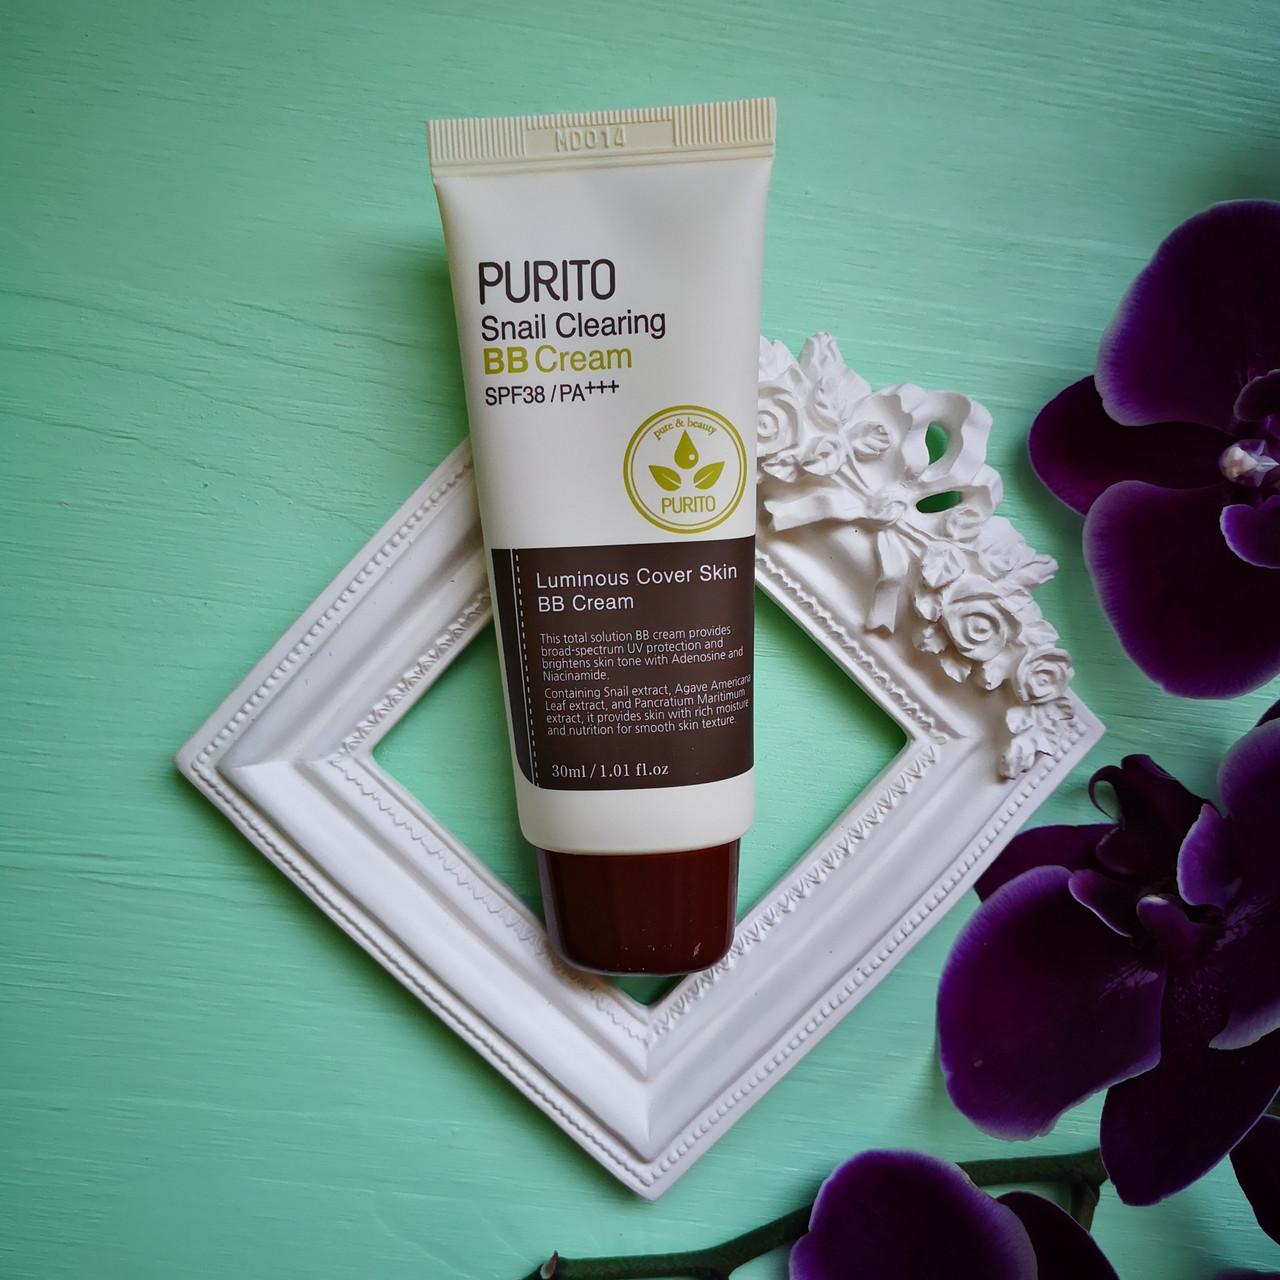 BB крем Purito с муцином улитки SPF38 PA+++ 23 Natural Beige Snail Clearing BB Cream SPF38 PA+++